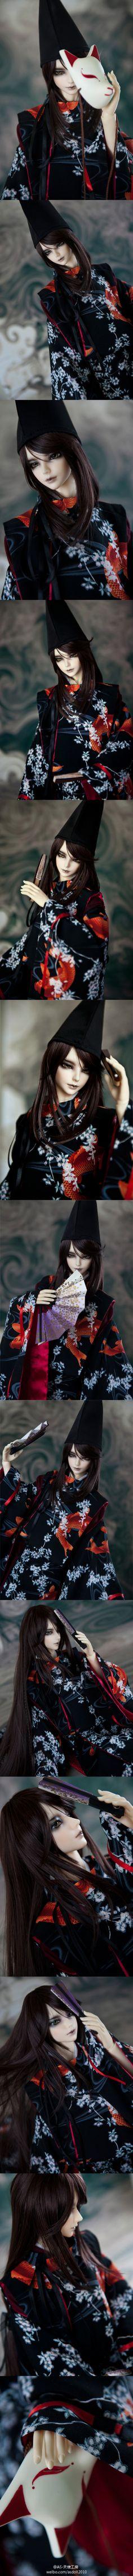 Angell-studio (BJD doll)----Honglee